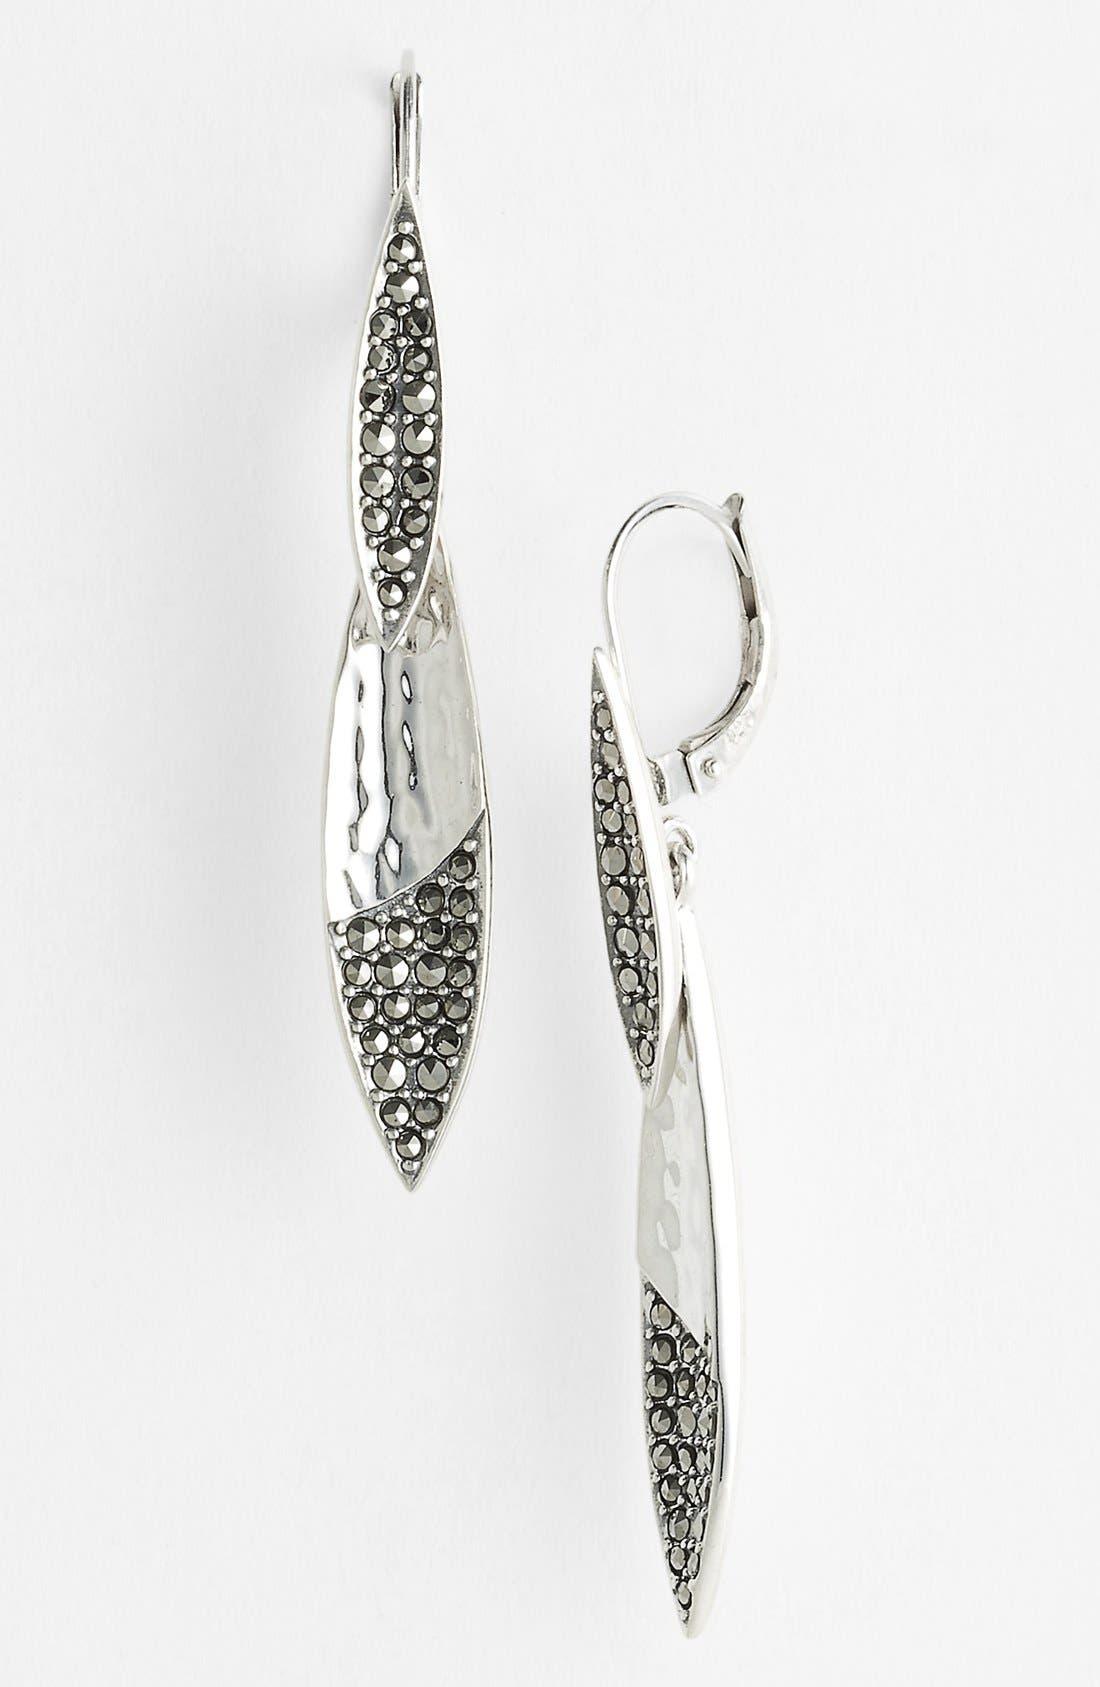 Alternate Image 1 Selected - Judith Jack 'Silver Rain' Double Drop Earrings (Nordstrom Exclusive)